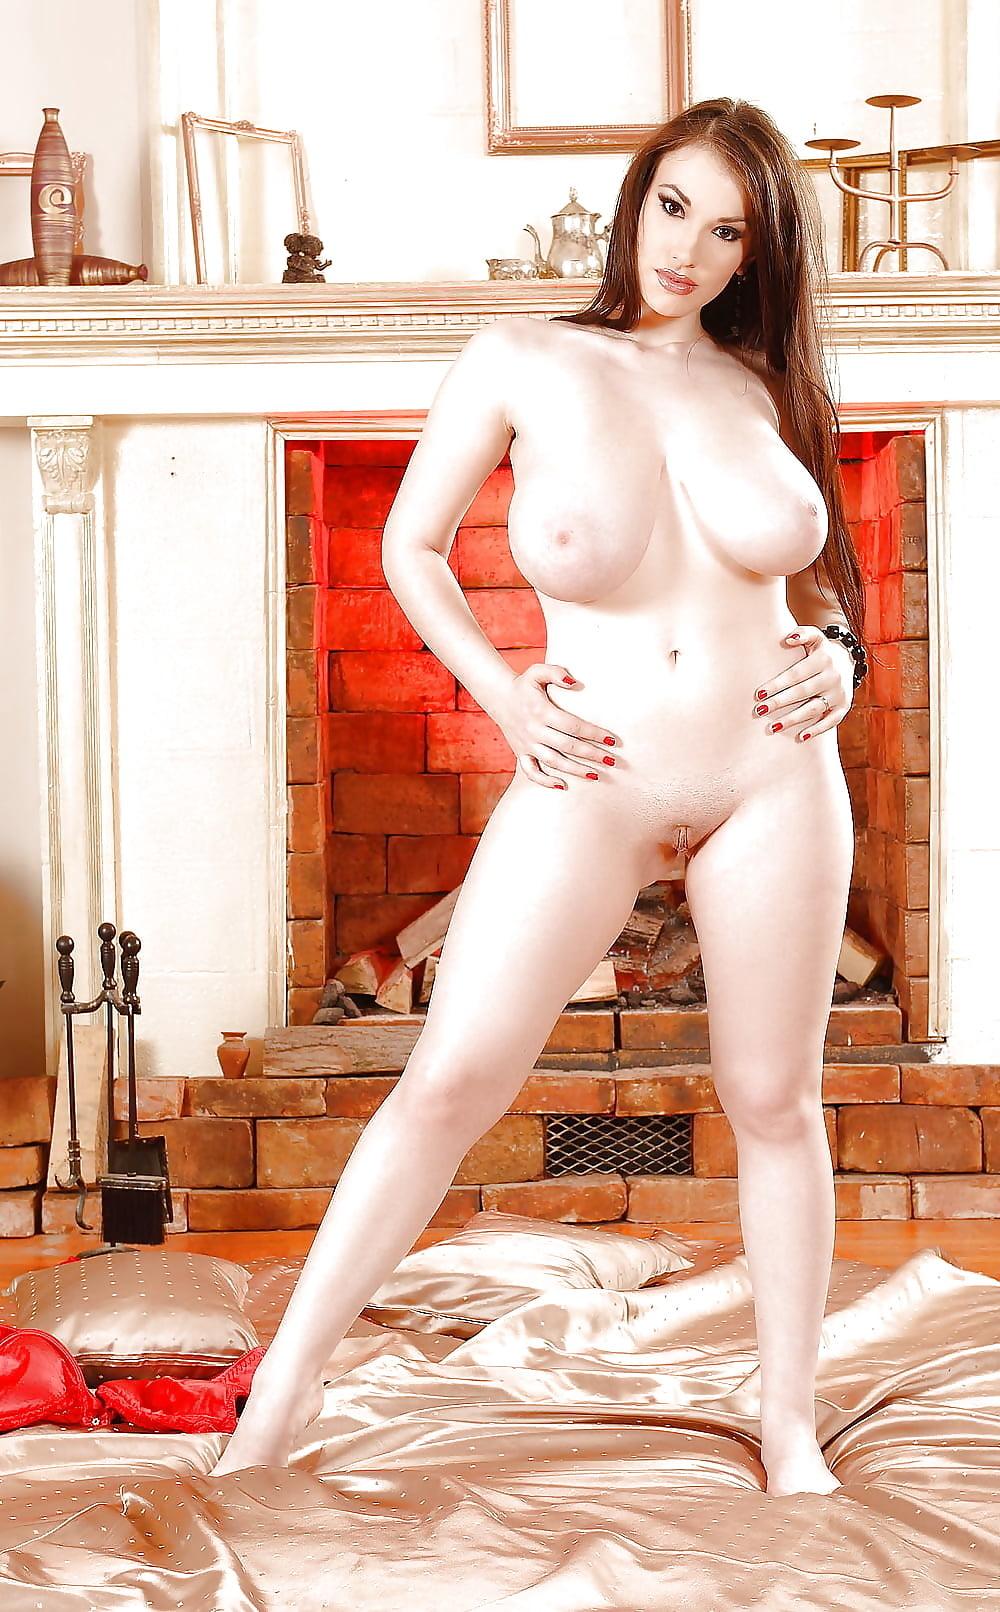 Kat dennings porn photos, video big tits milfs raunchy